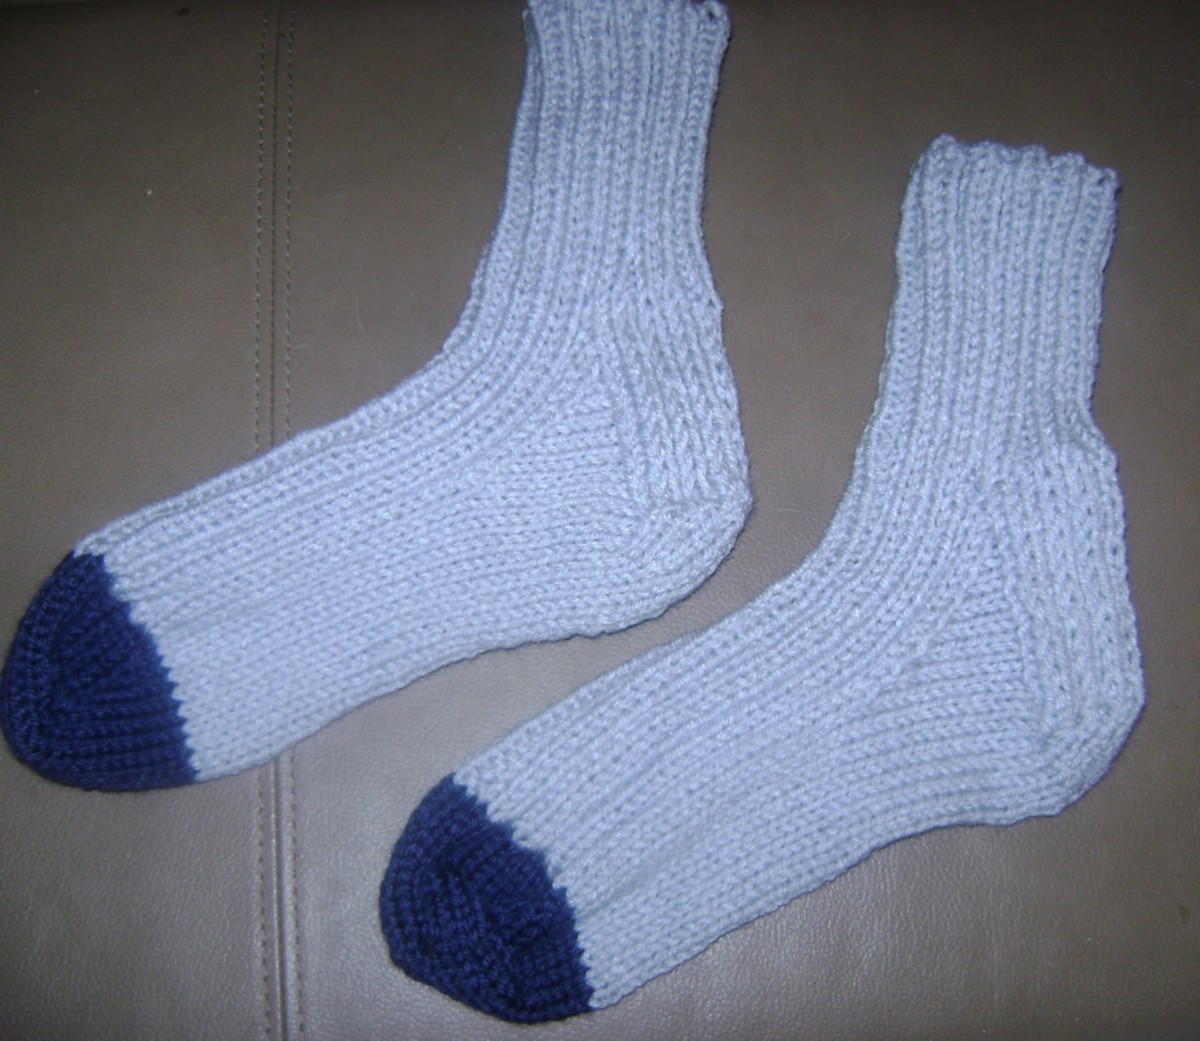 Heavy Socks in Worsted Yarn